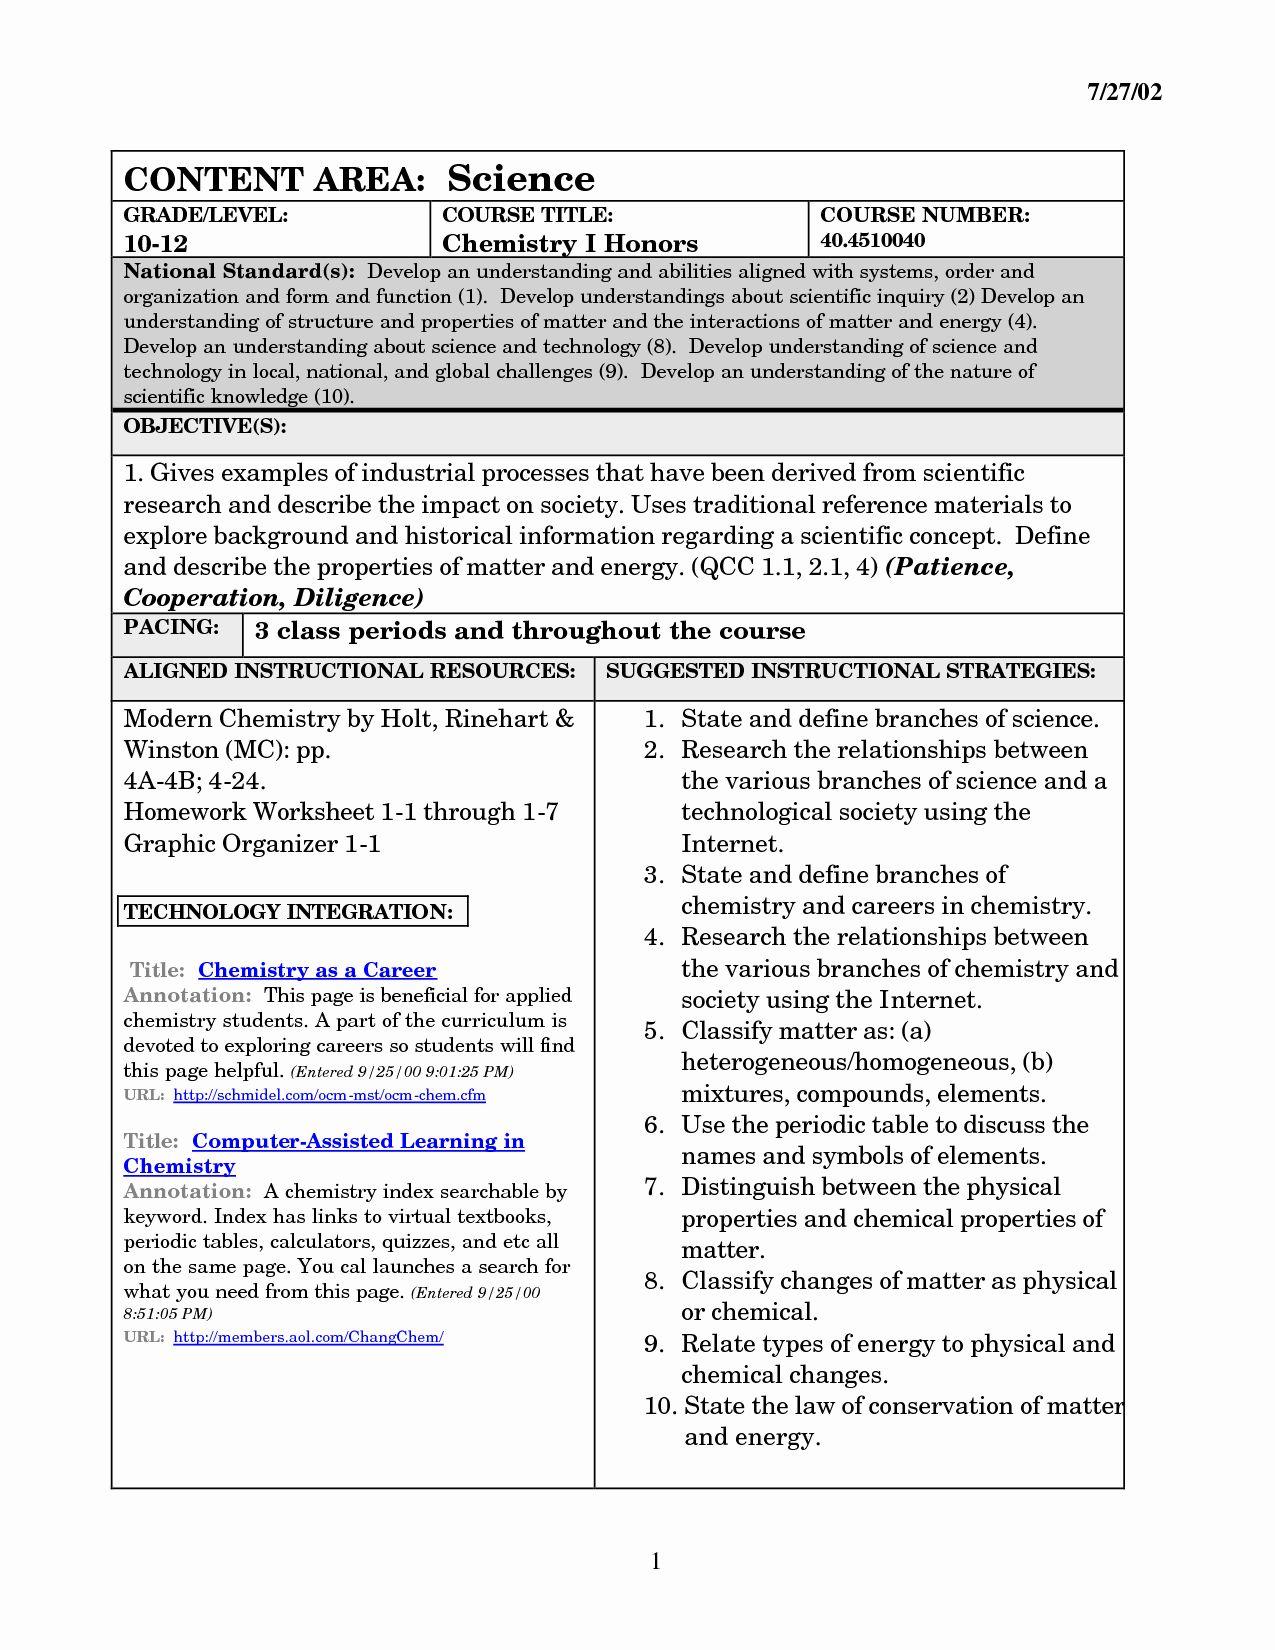 Classifying Matter Worksheet Answers Inspirational 15 Best ...